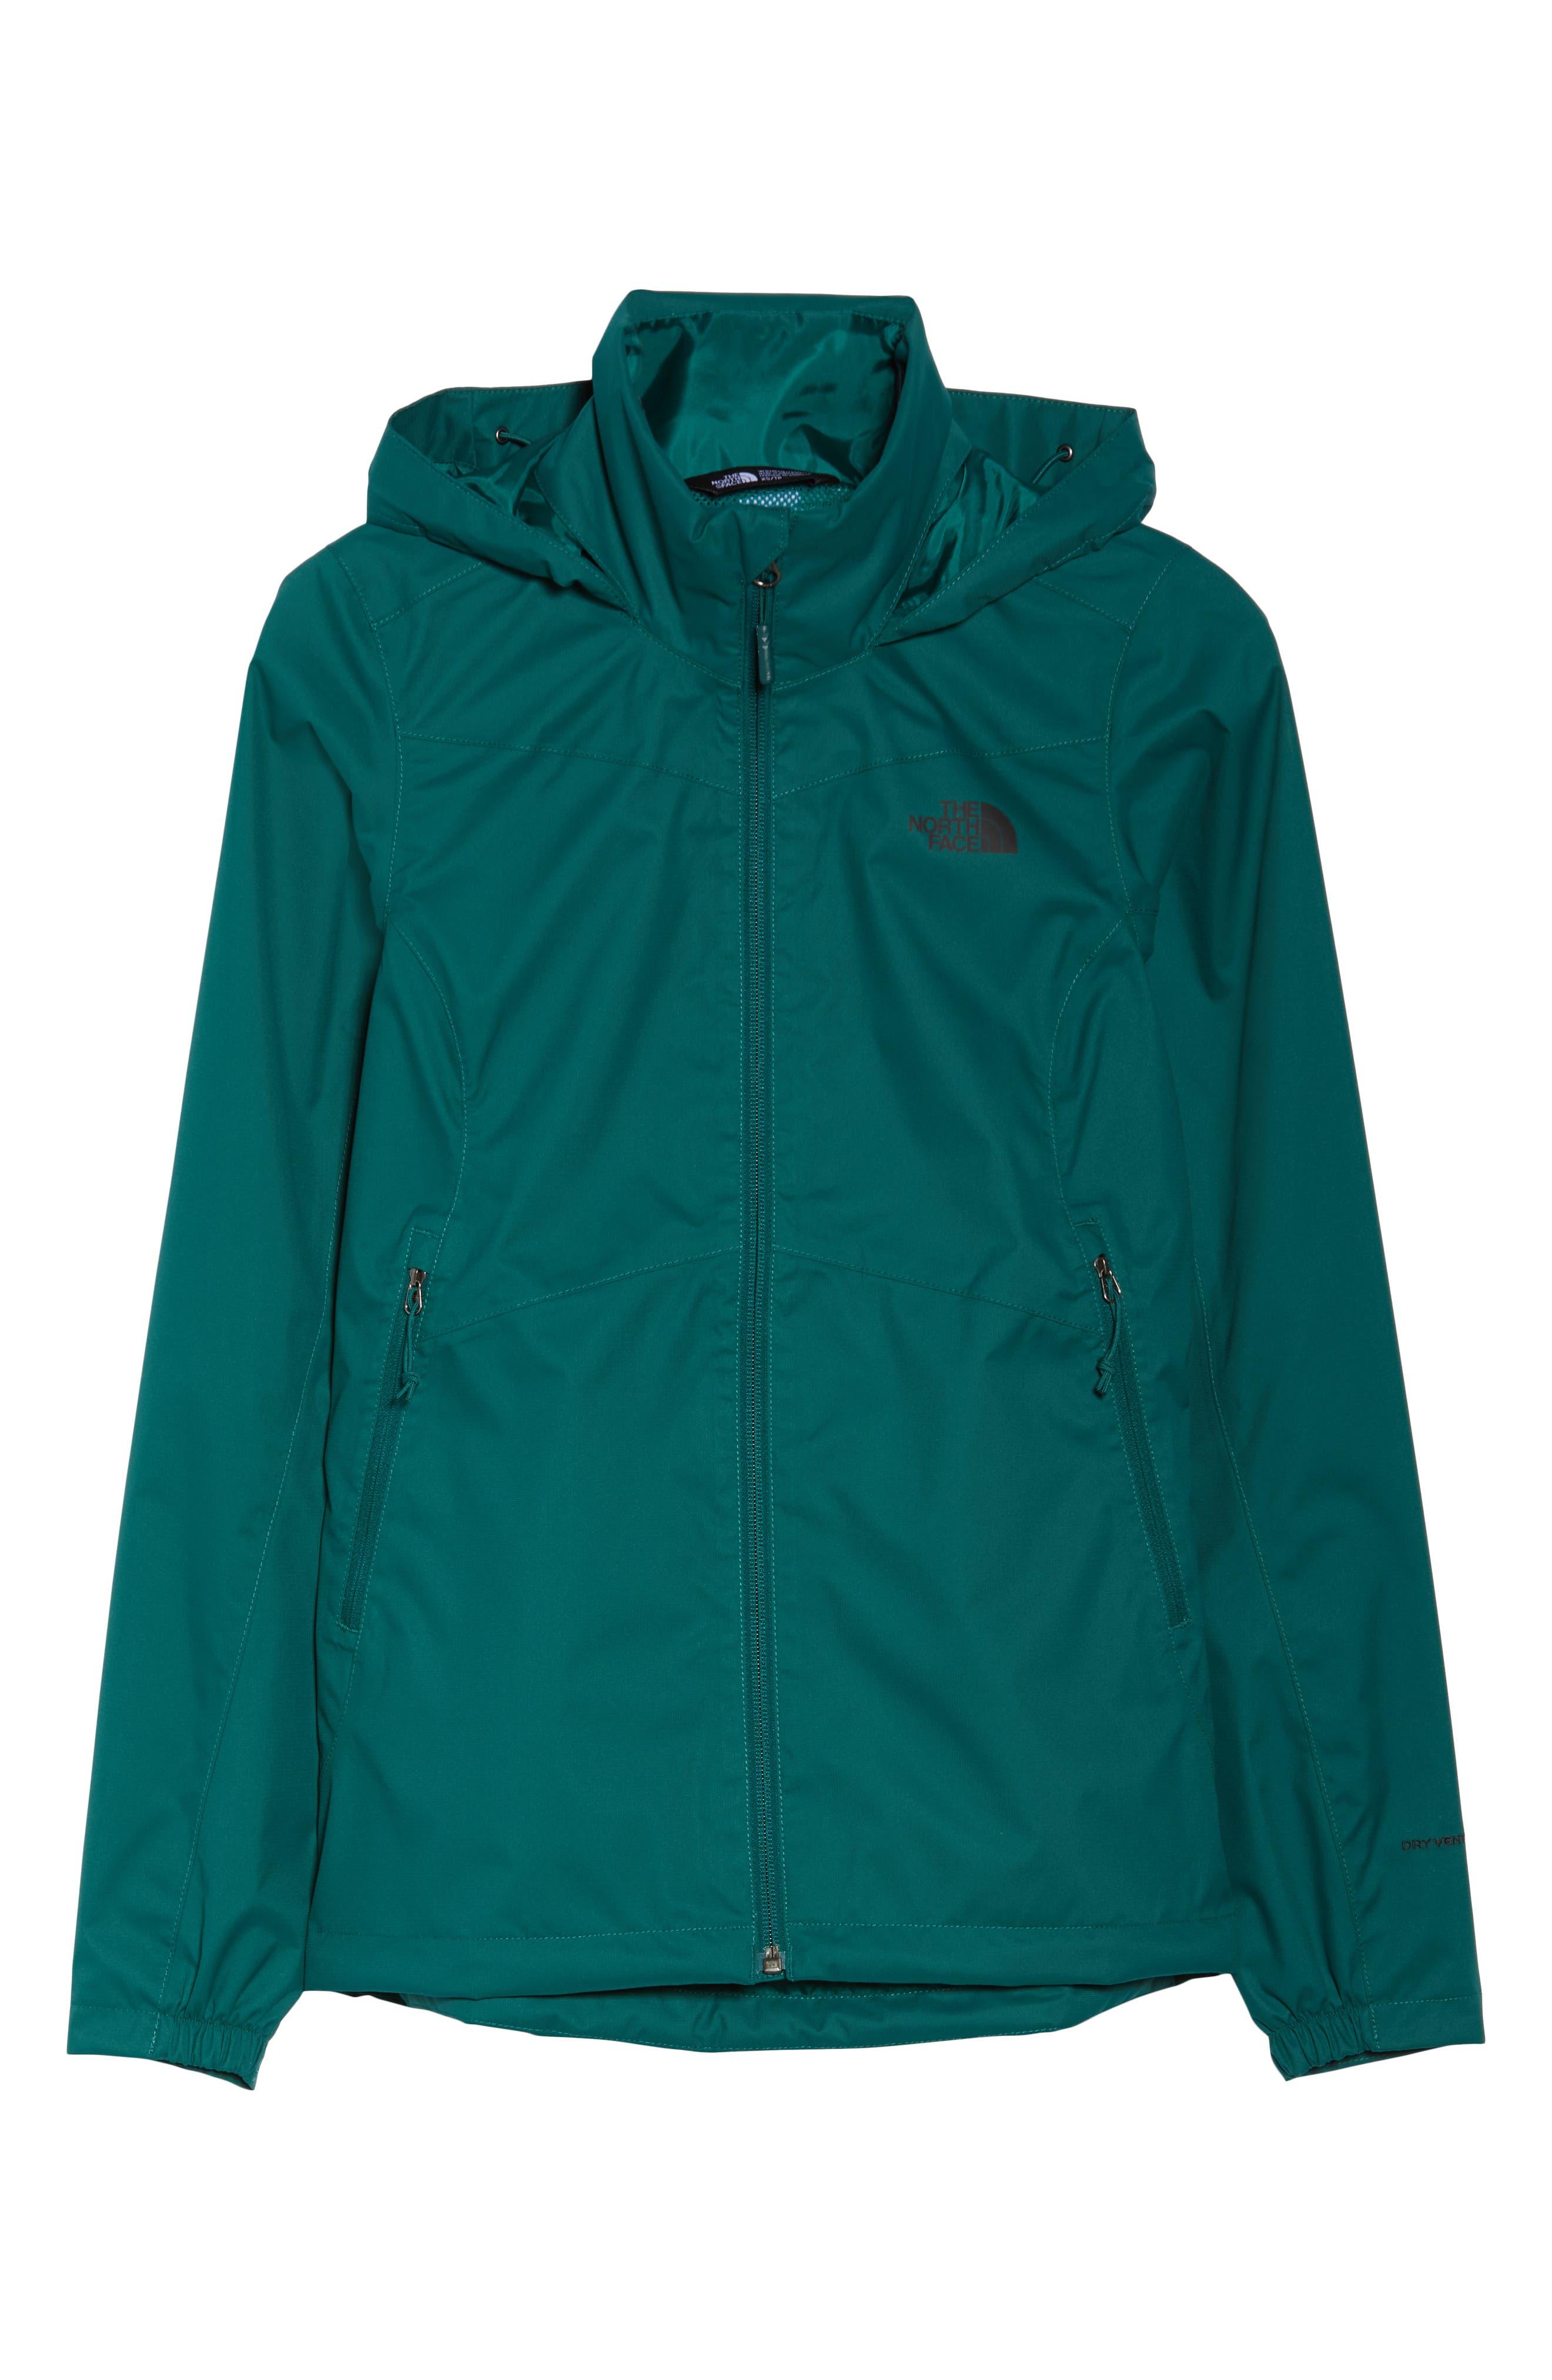 Resolve Plus Waterproof Jacket,                             Alternate thumbnail 6, color,                             BOTANICAL GREEN